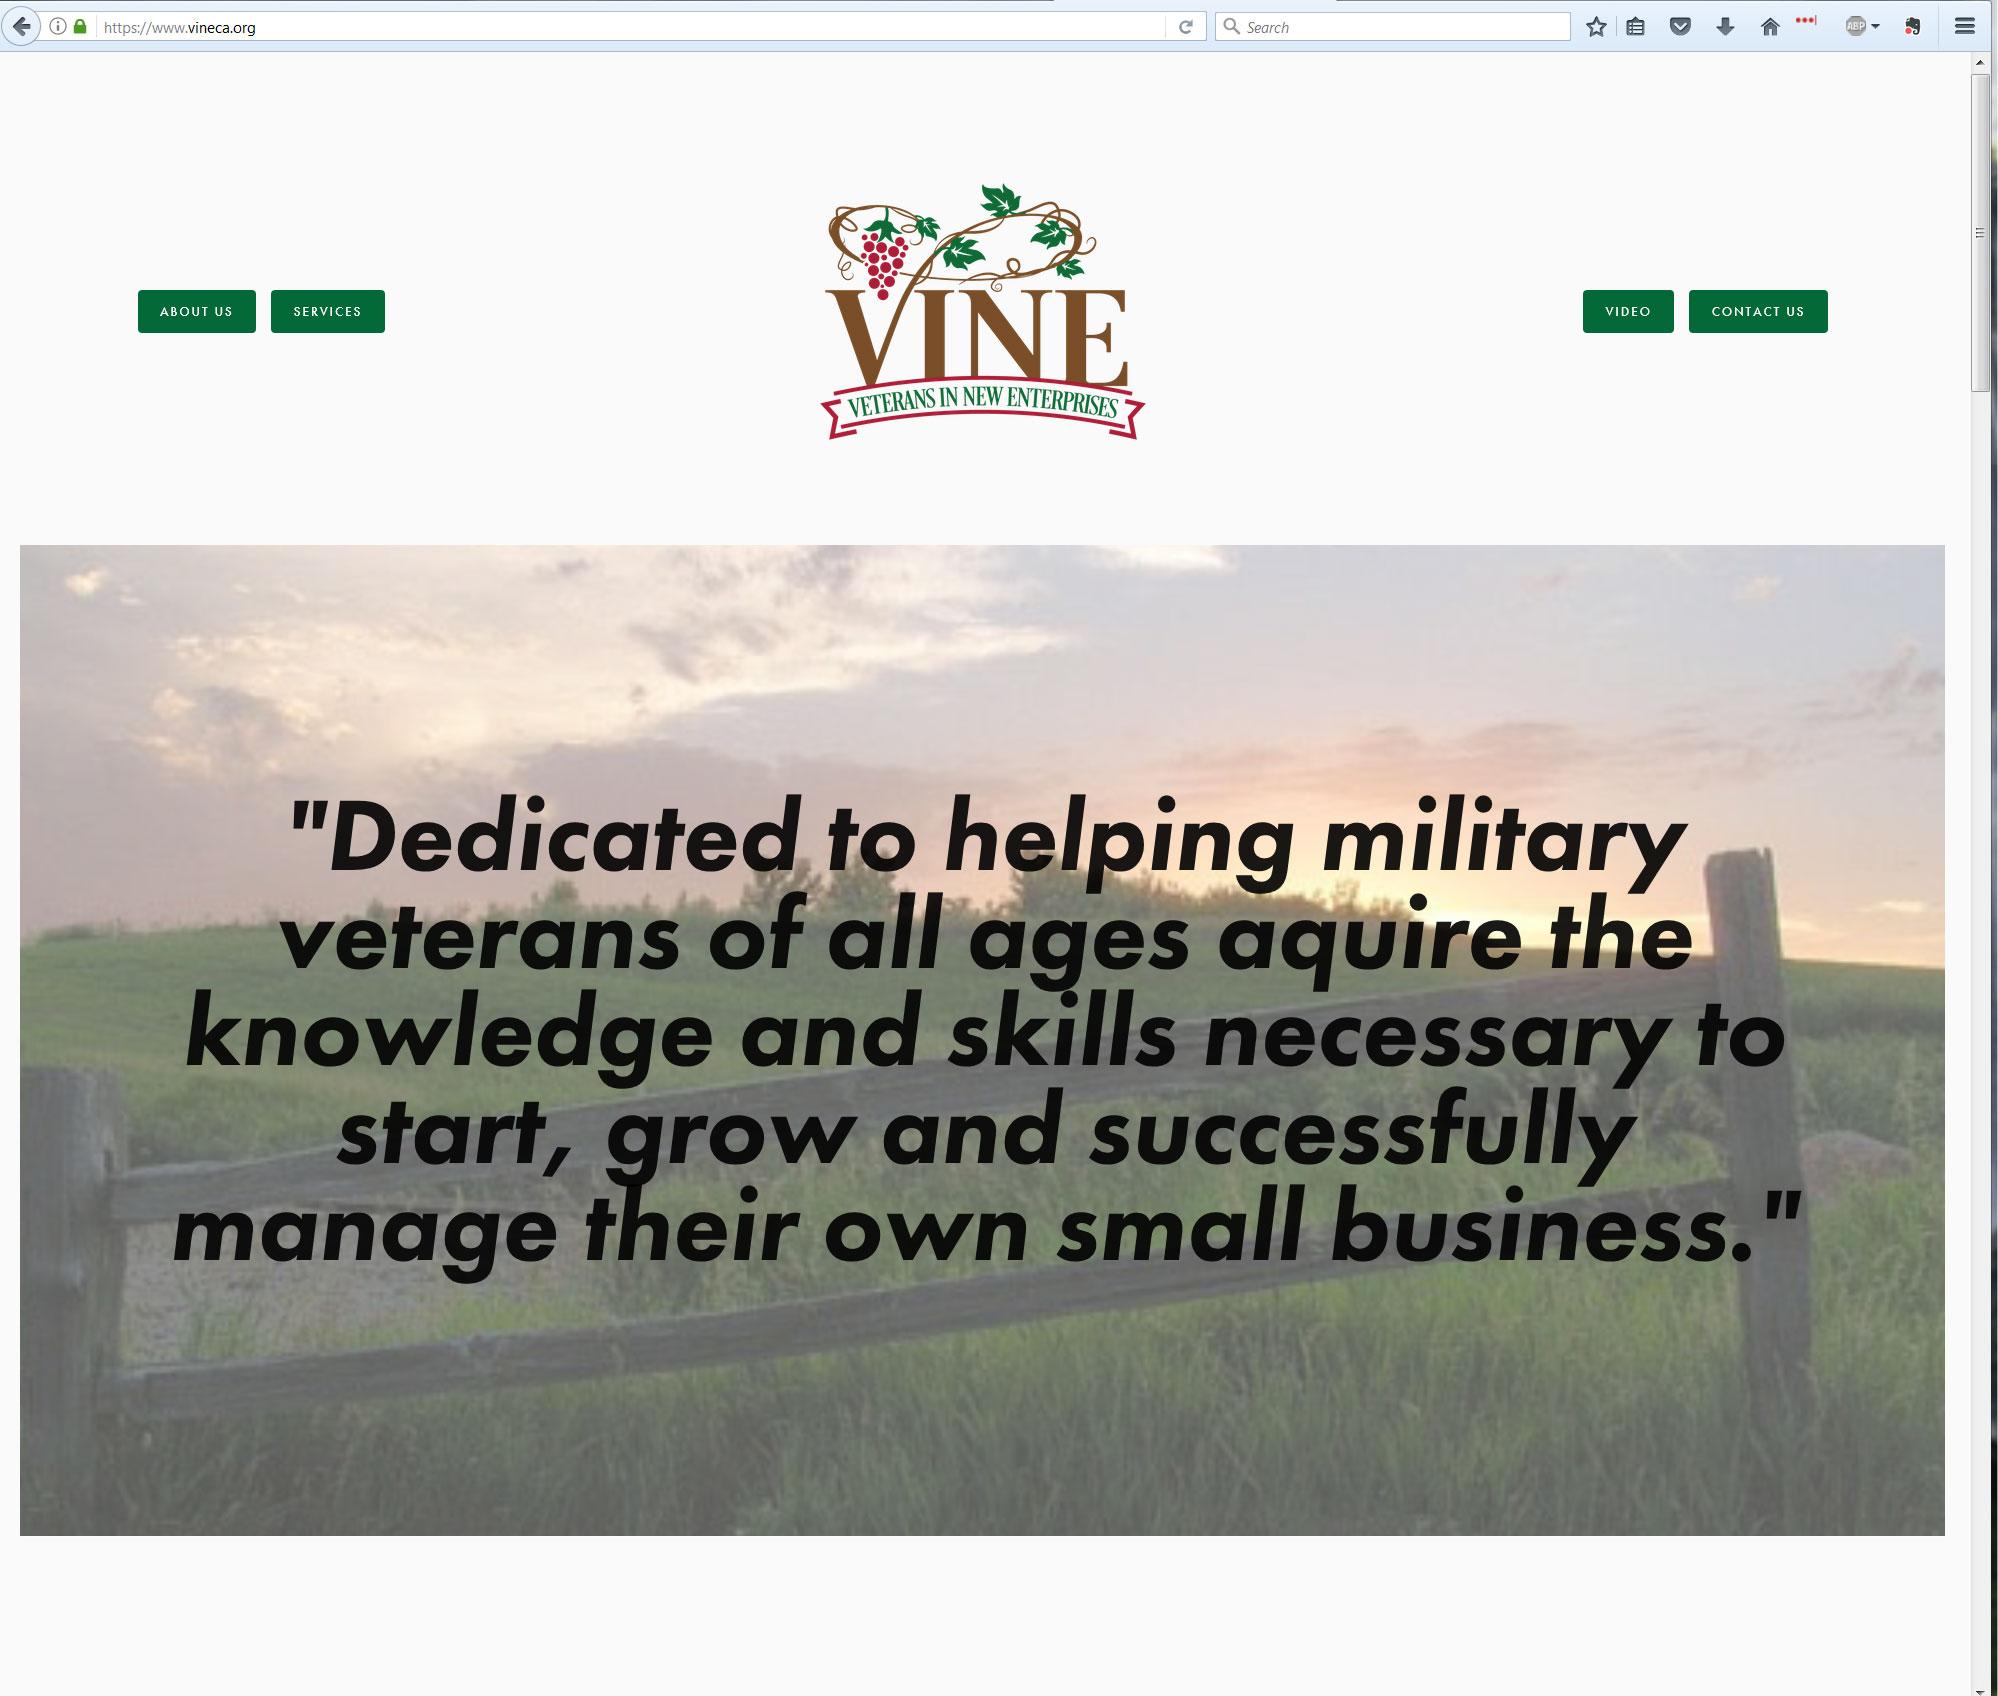 VINE homepage